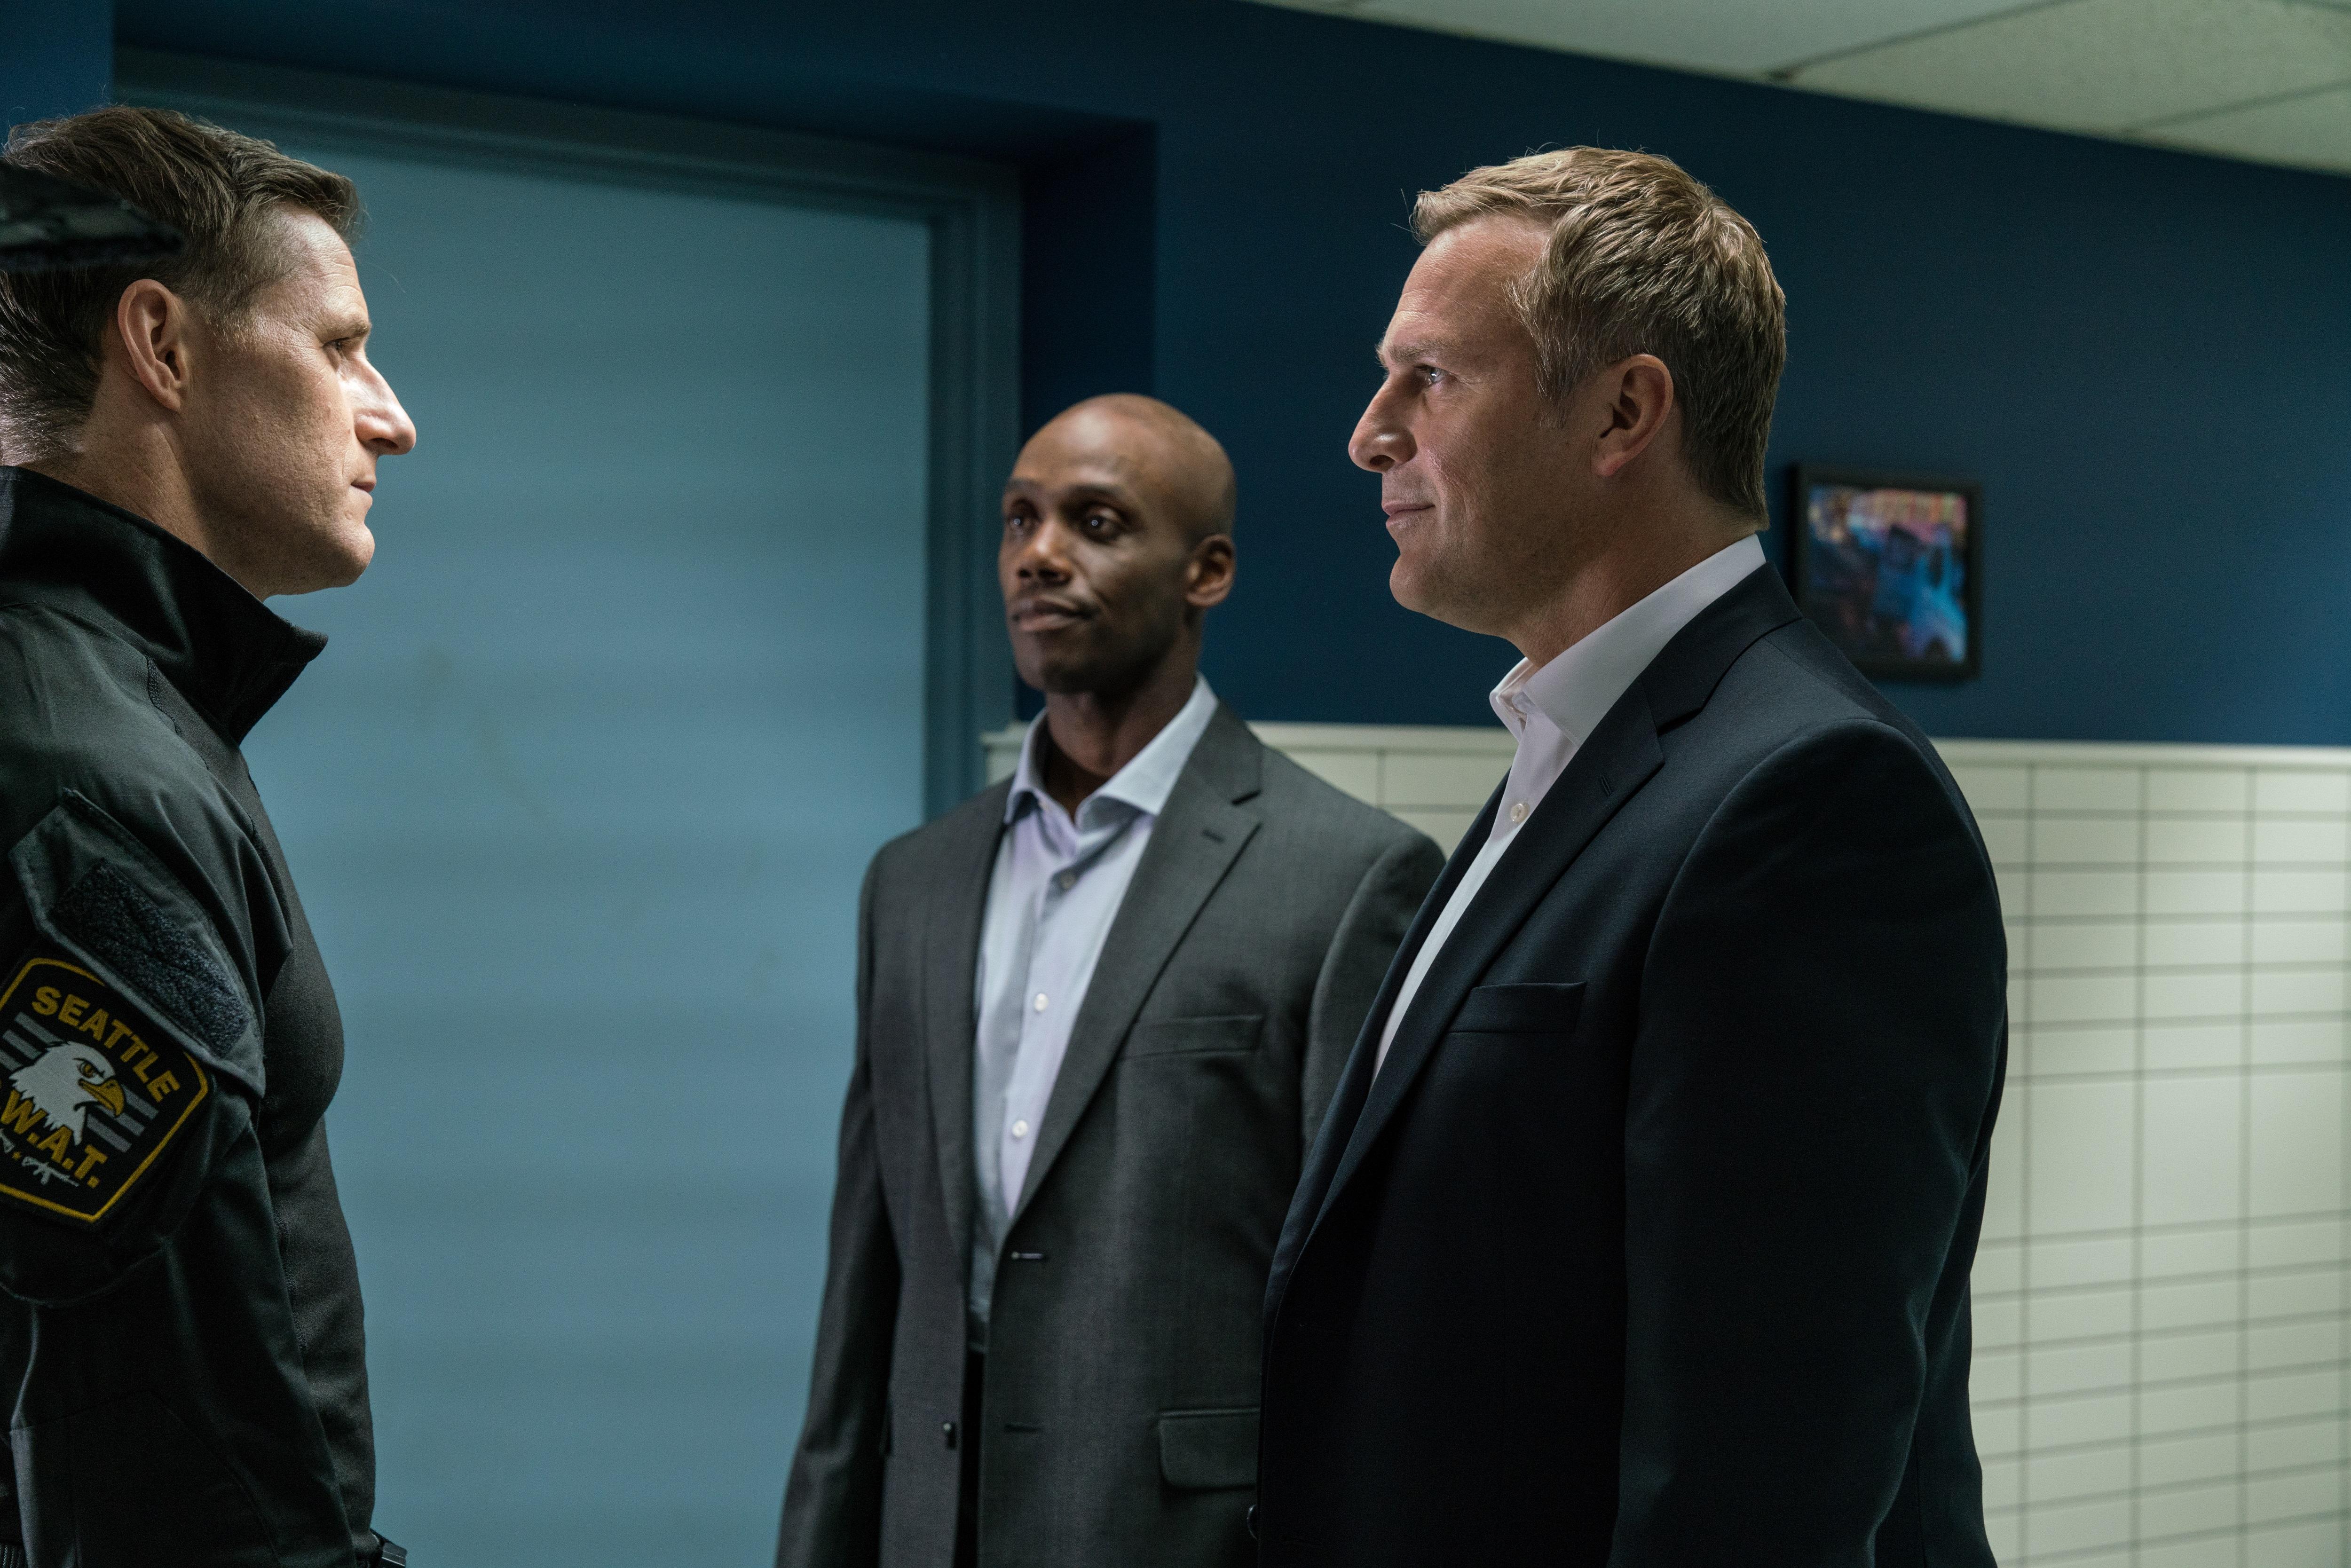 S.W.A.T.-Unter-Verdacht-Blu-ray-Review-Szene-5.jpg